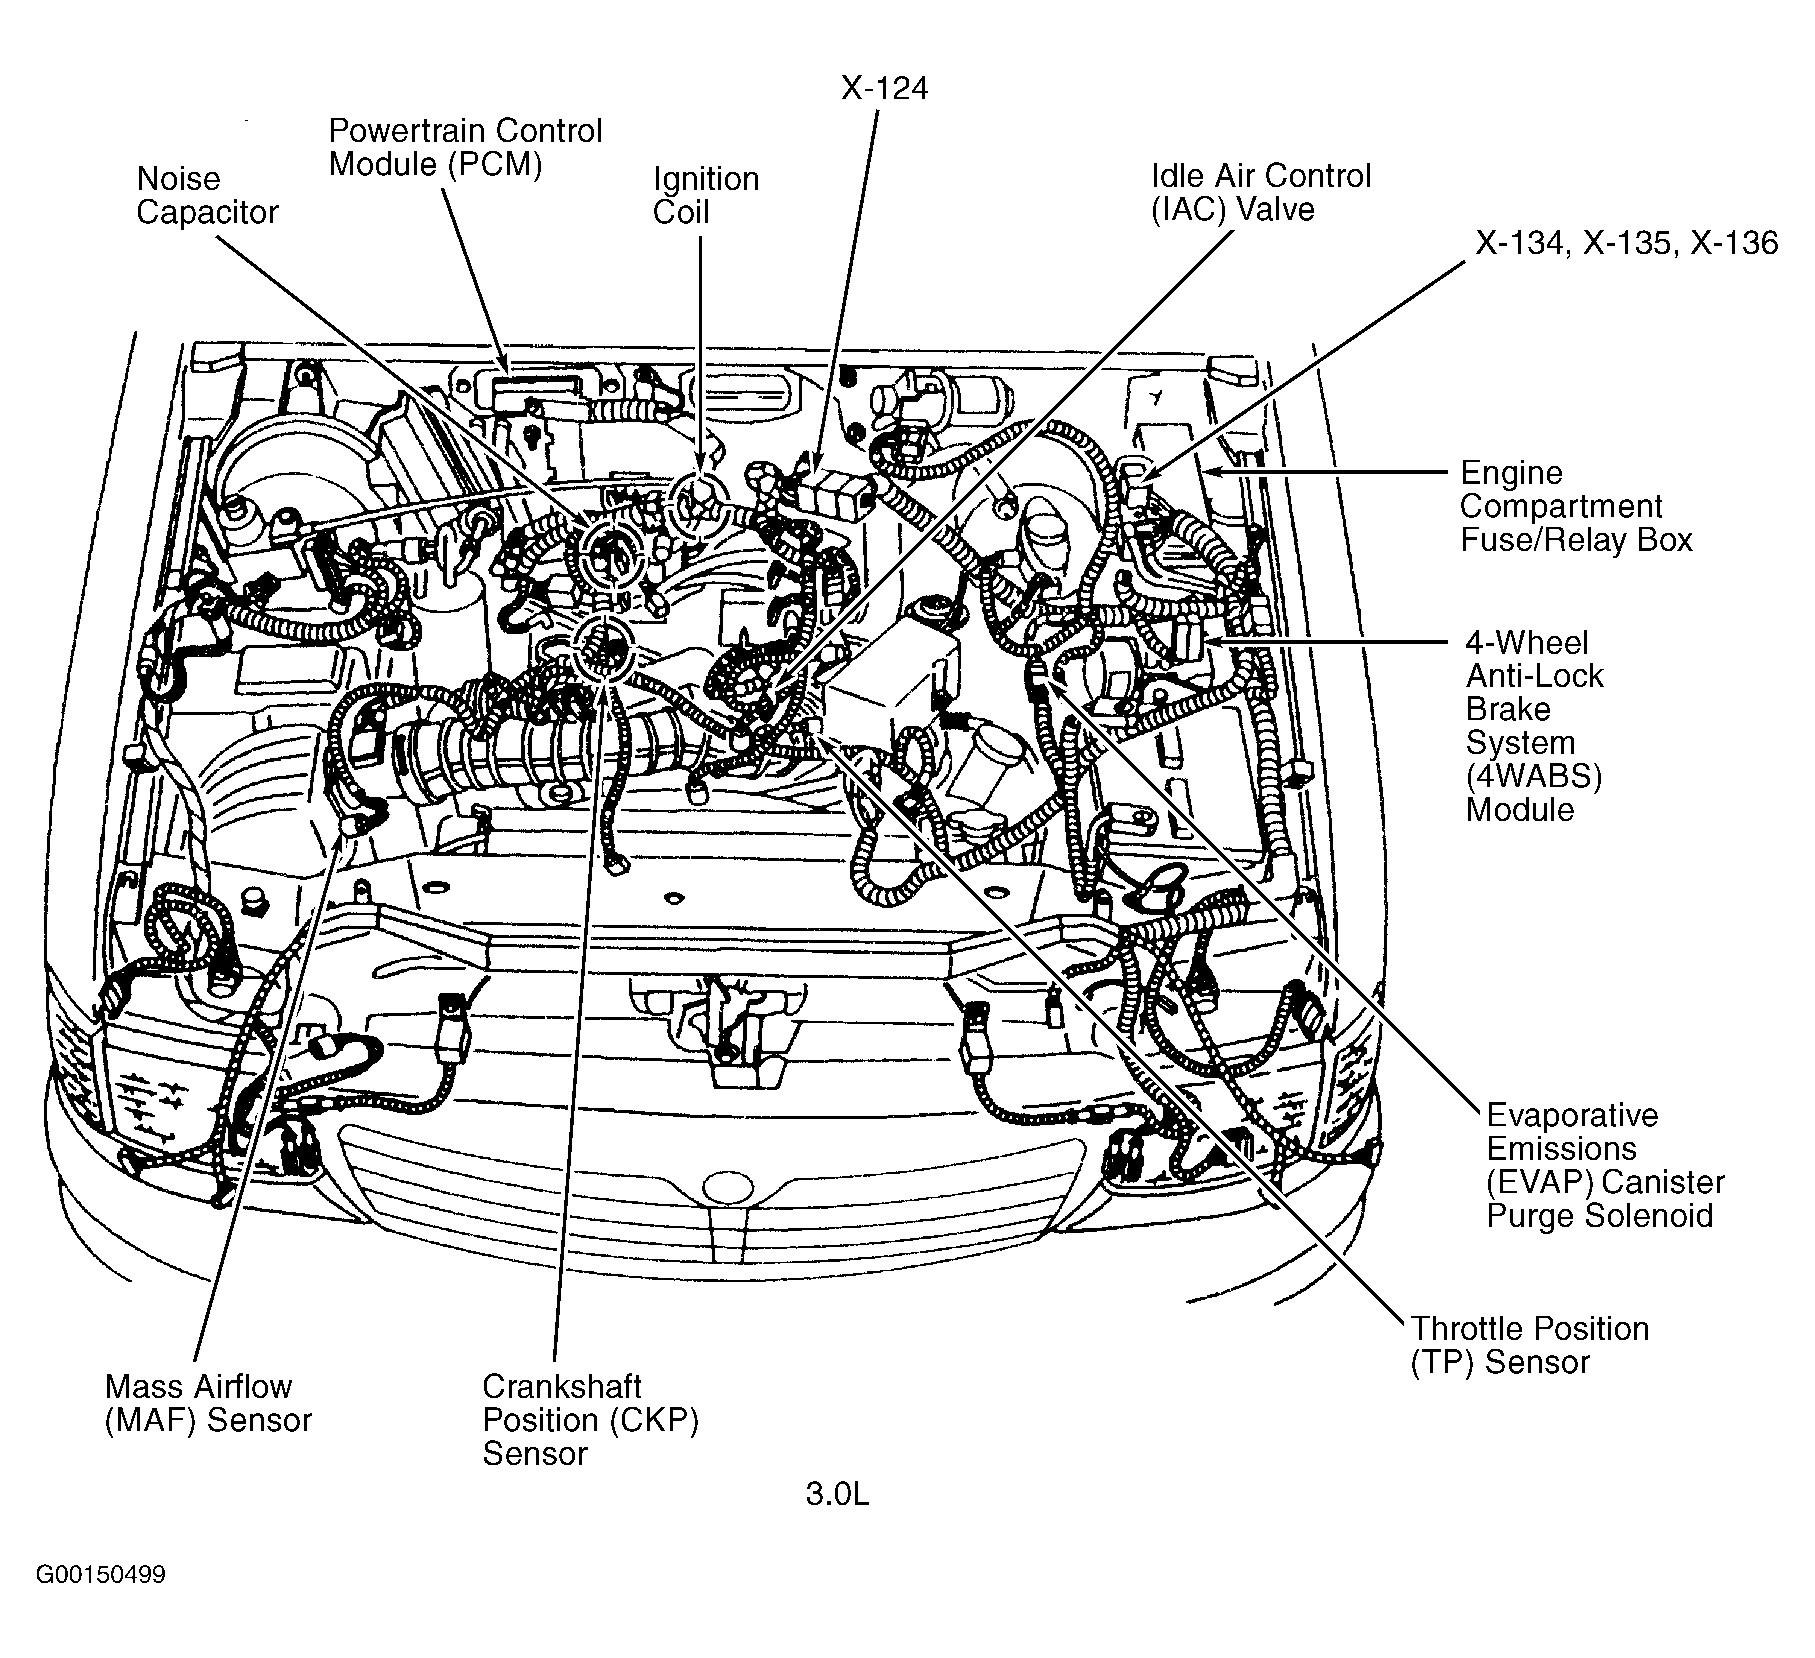 1998 ford Escort Zx2 Engine Diagram 2000 Volvo S80 Engine Diagram 2004 Mazda Rx8 Engine Diagram Mazda Of 1998 ford Escort Zx2 Engine Diagram 1993 ford Escort Wiring Diagram Fresh 1993 ford F150 Alternator